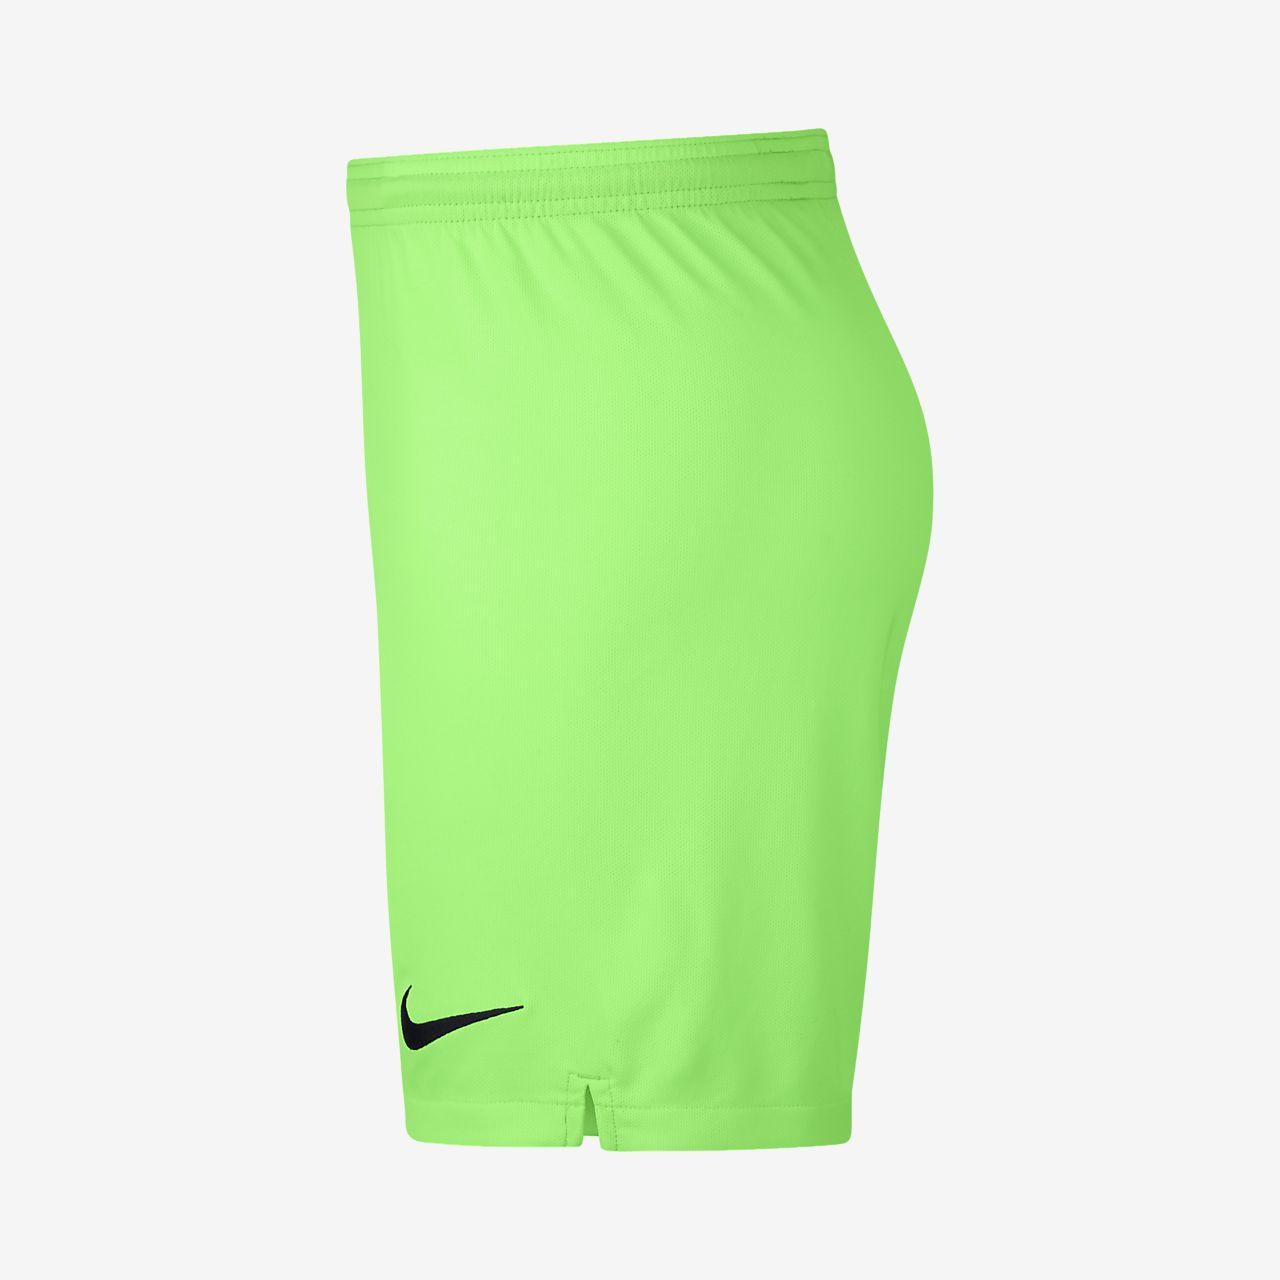 71656b5da8d 2018 19 FC Barcelona Stadium Goalkeeper Men s Football Shorts. Nike ...